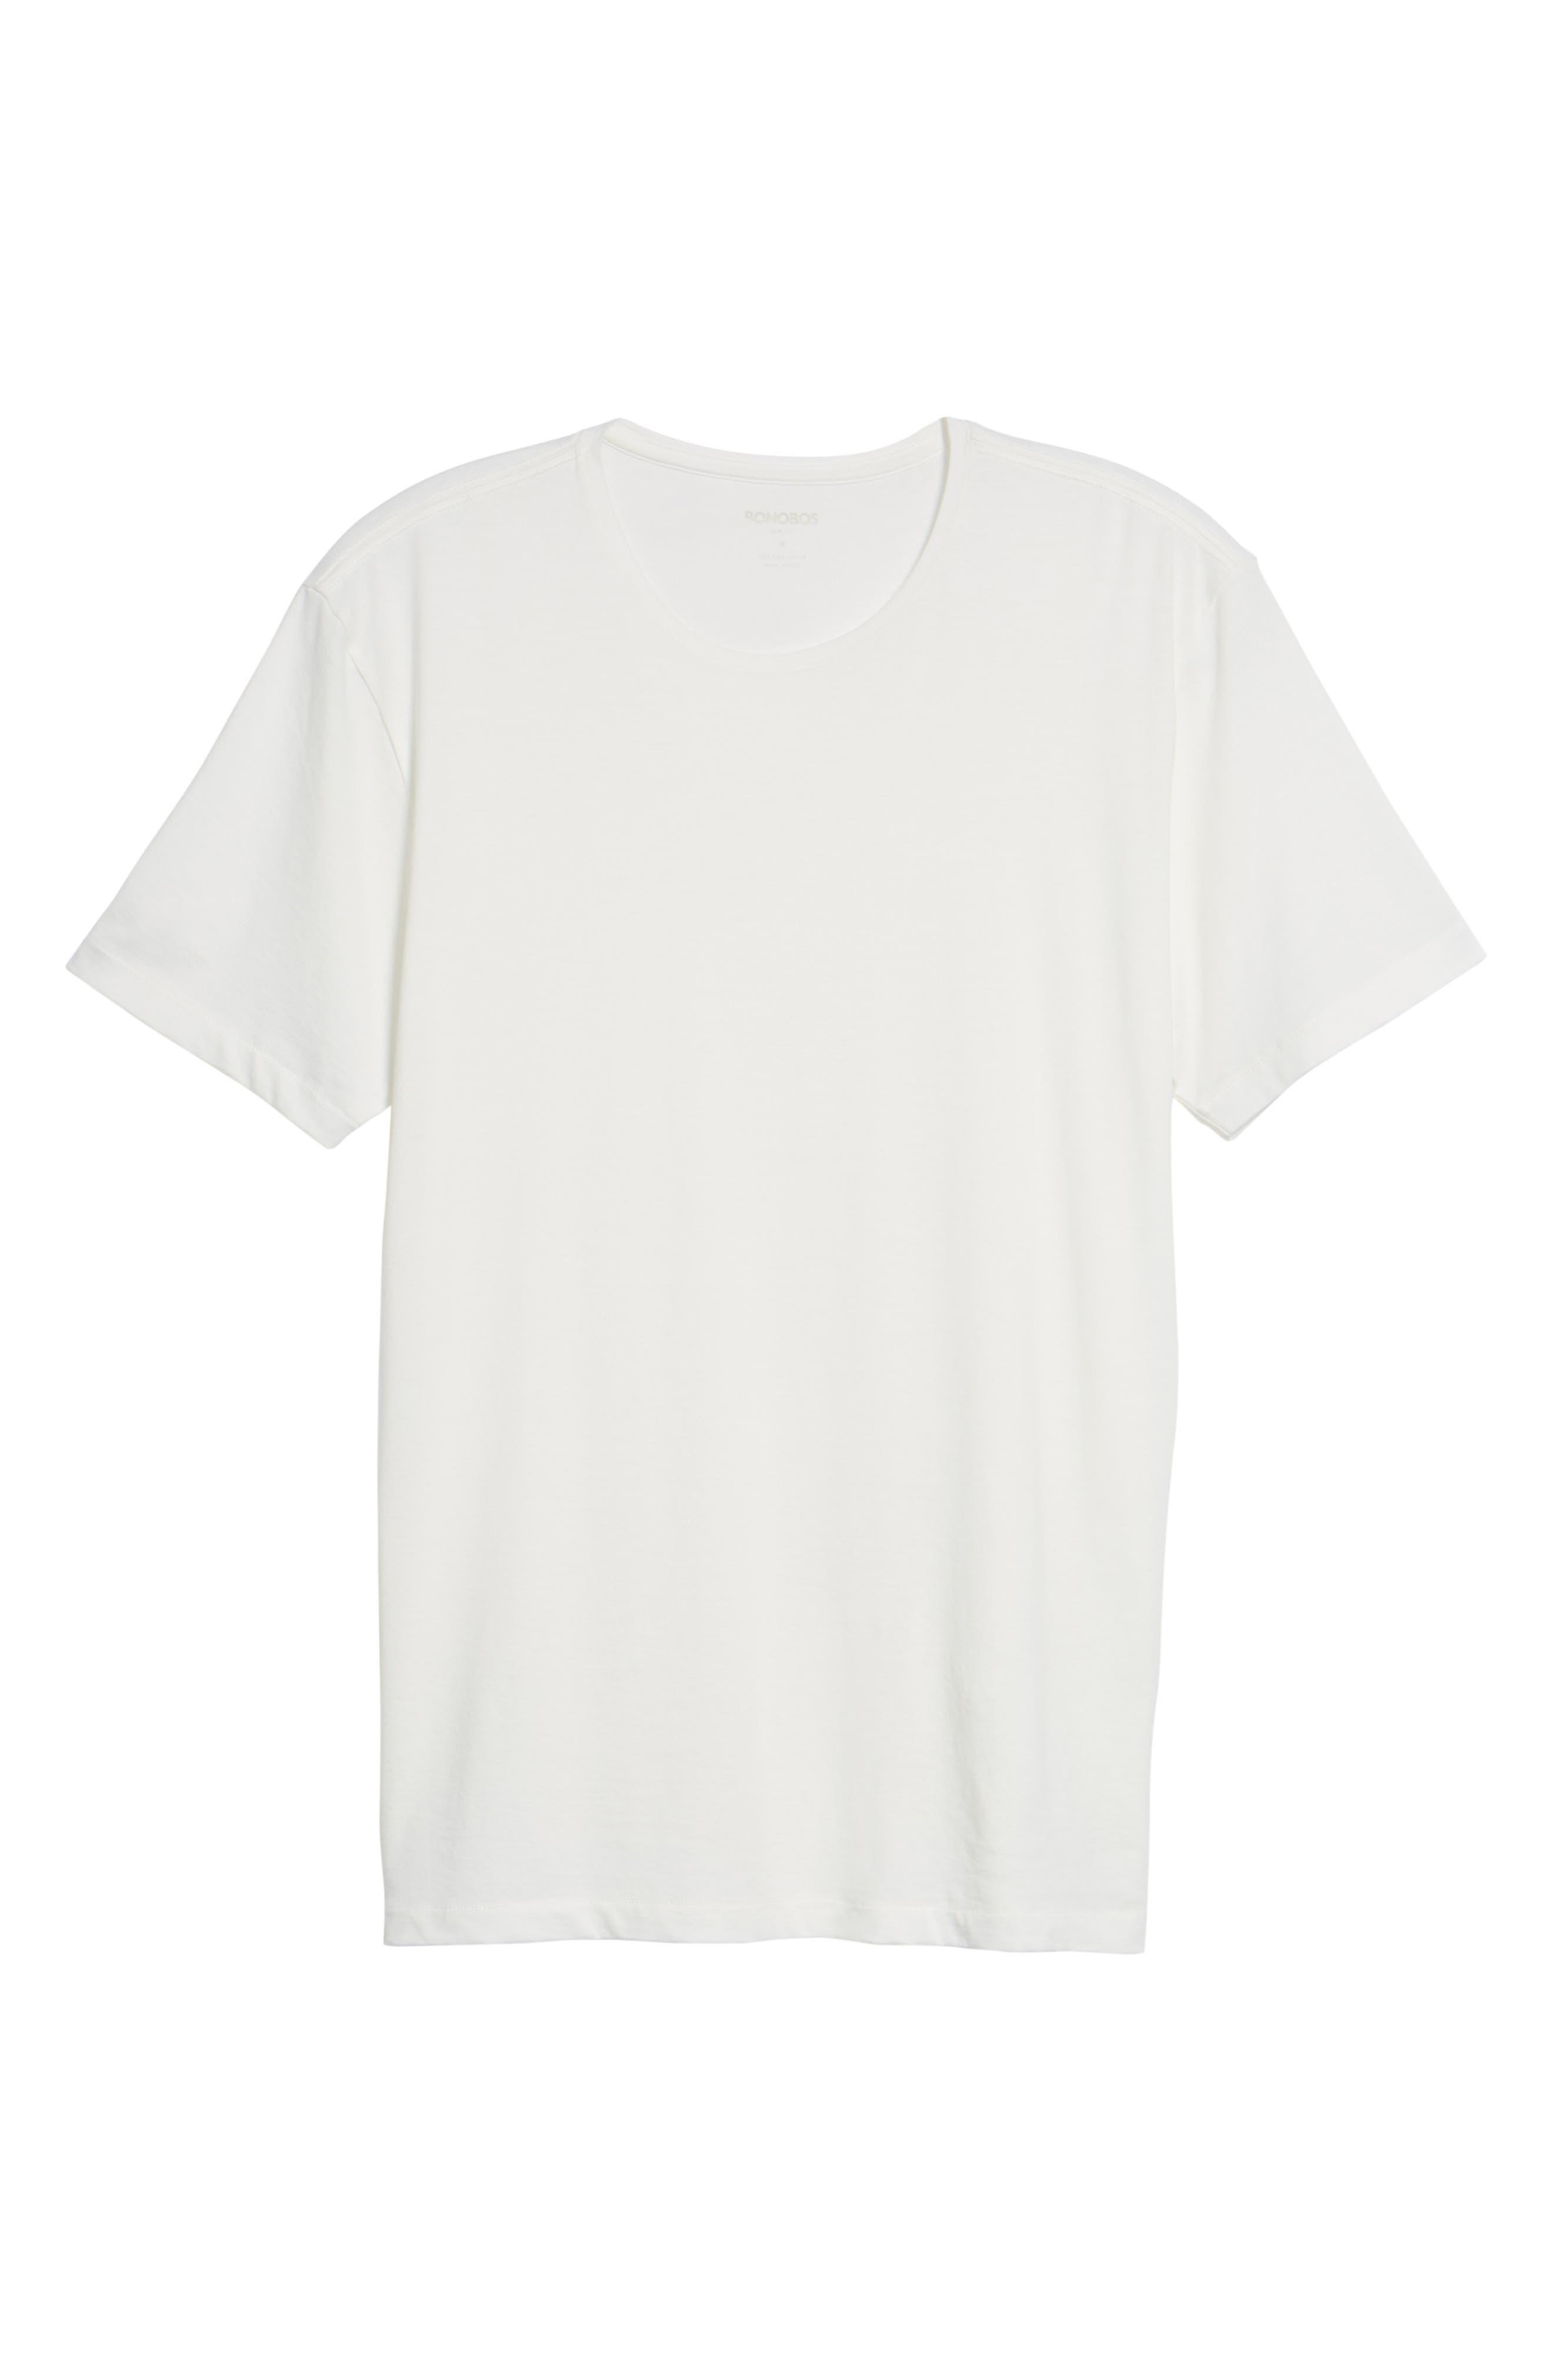 Refined T-Shirt,                             Alternate thumbnail 6, color,                             White